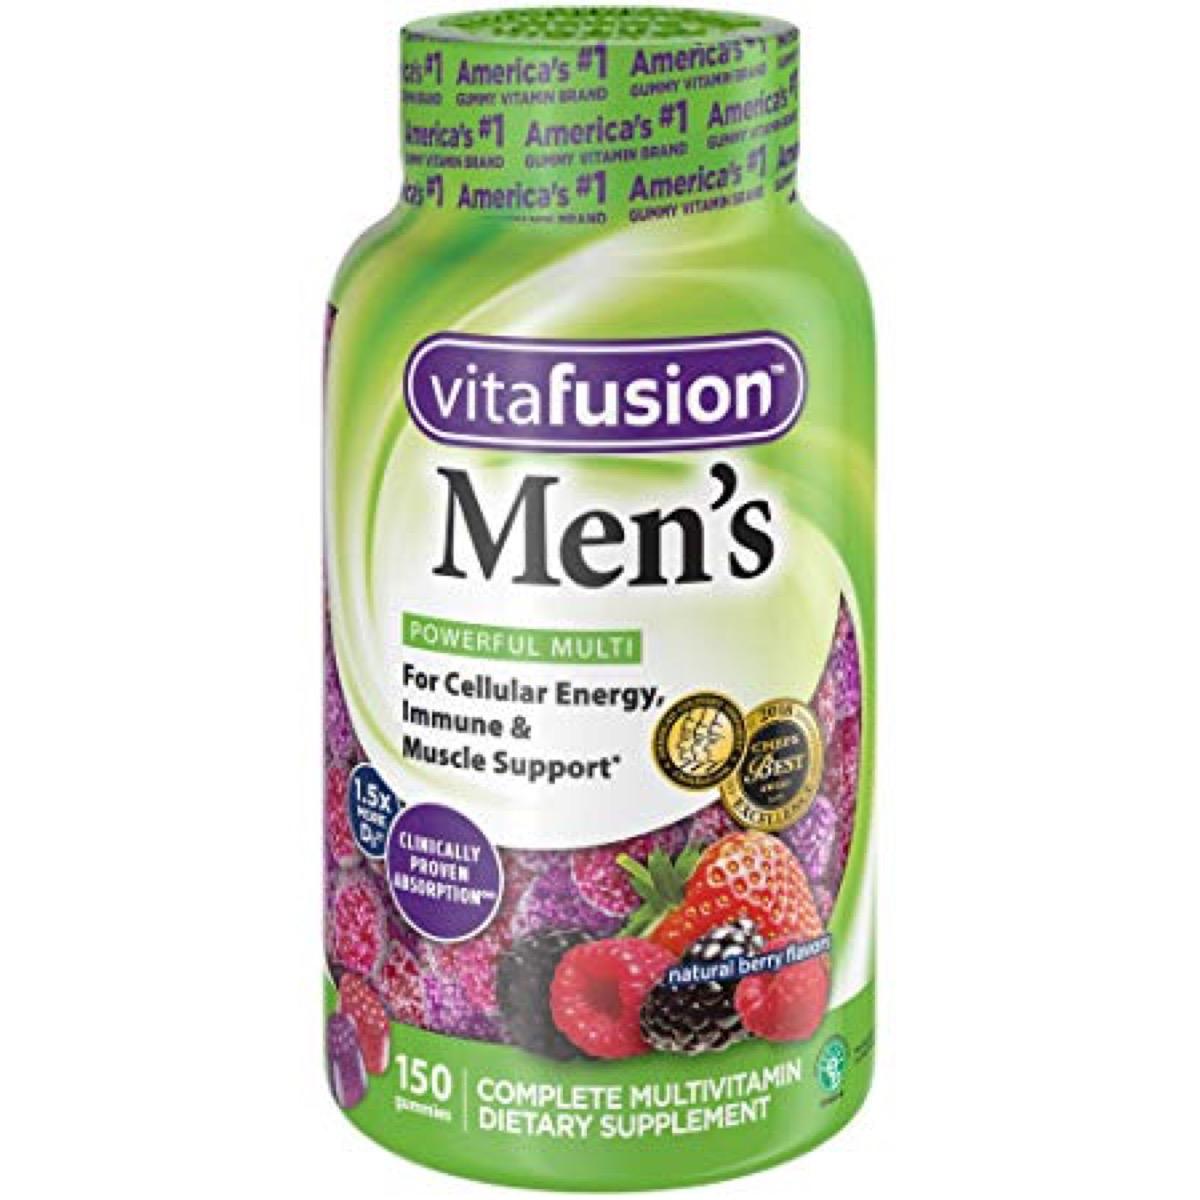 vitafusion, best multivitamin for men